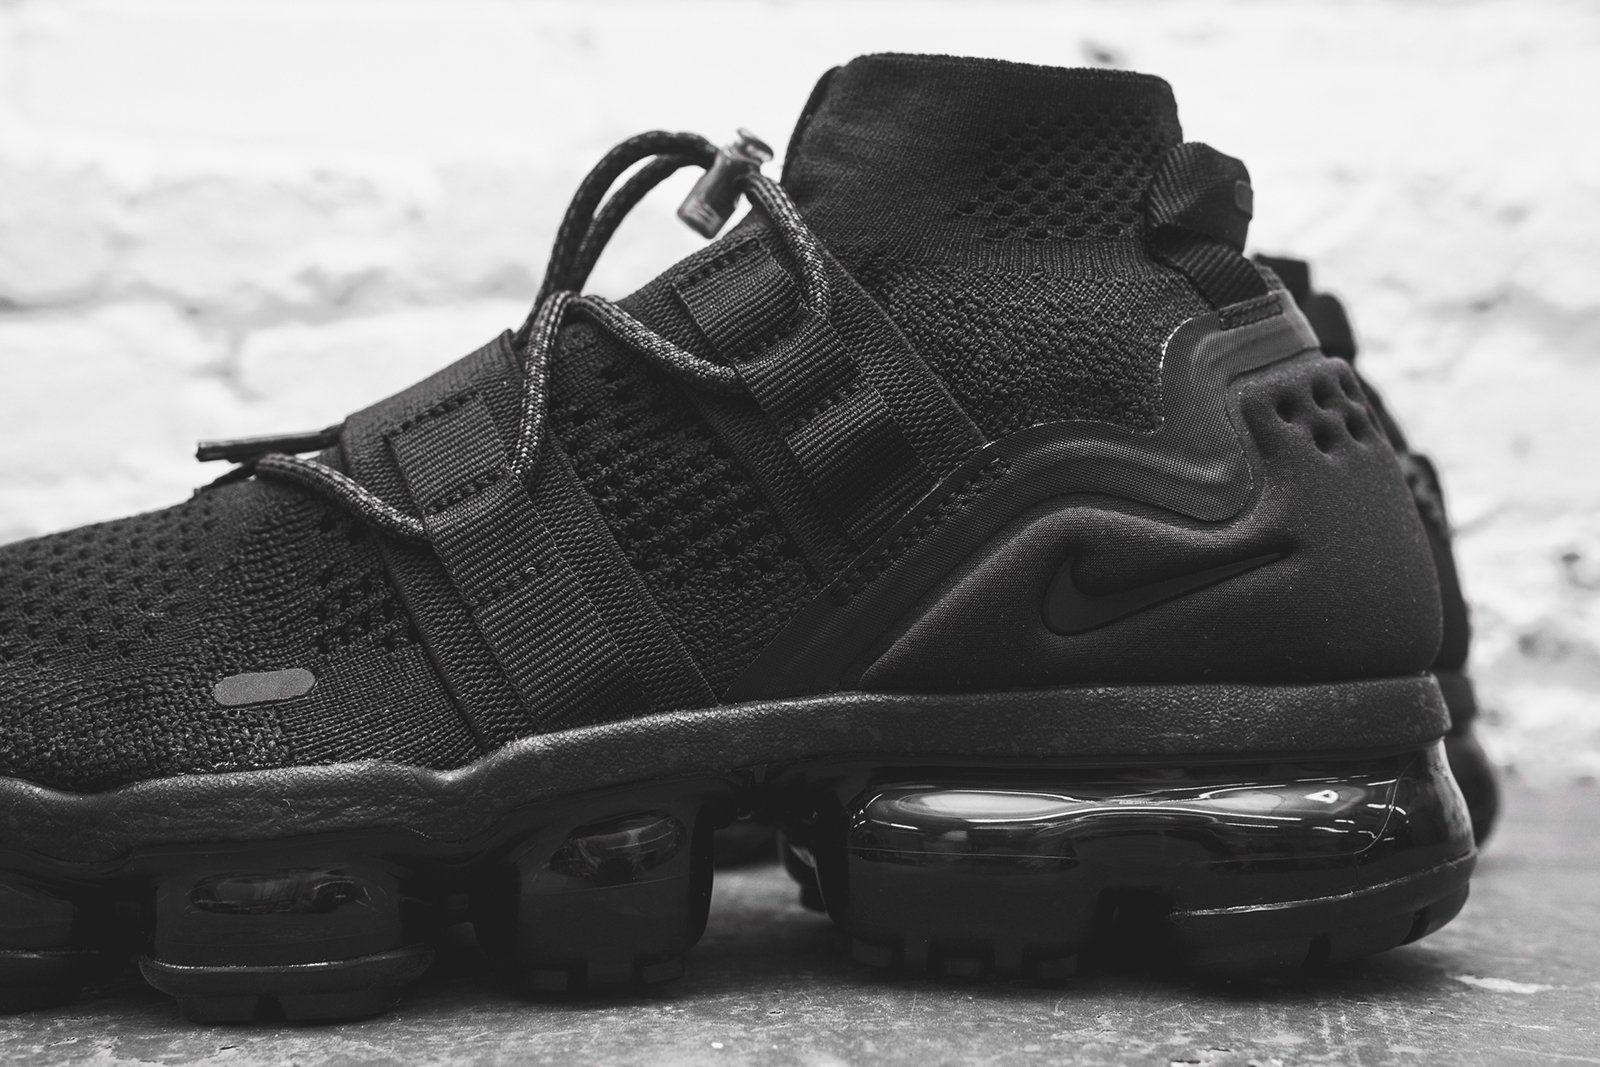 new arrival 88203 d5c69 Nike Air VaporMax FK Utility - Triple Black | Sneaker | Nike ...